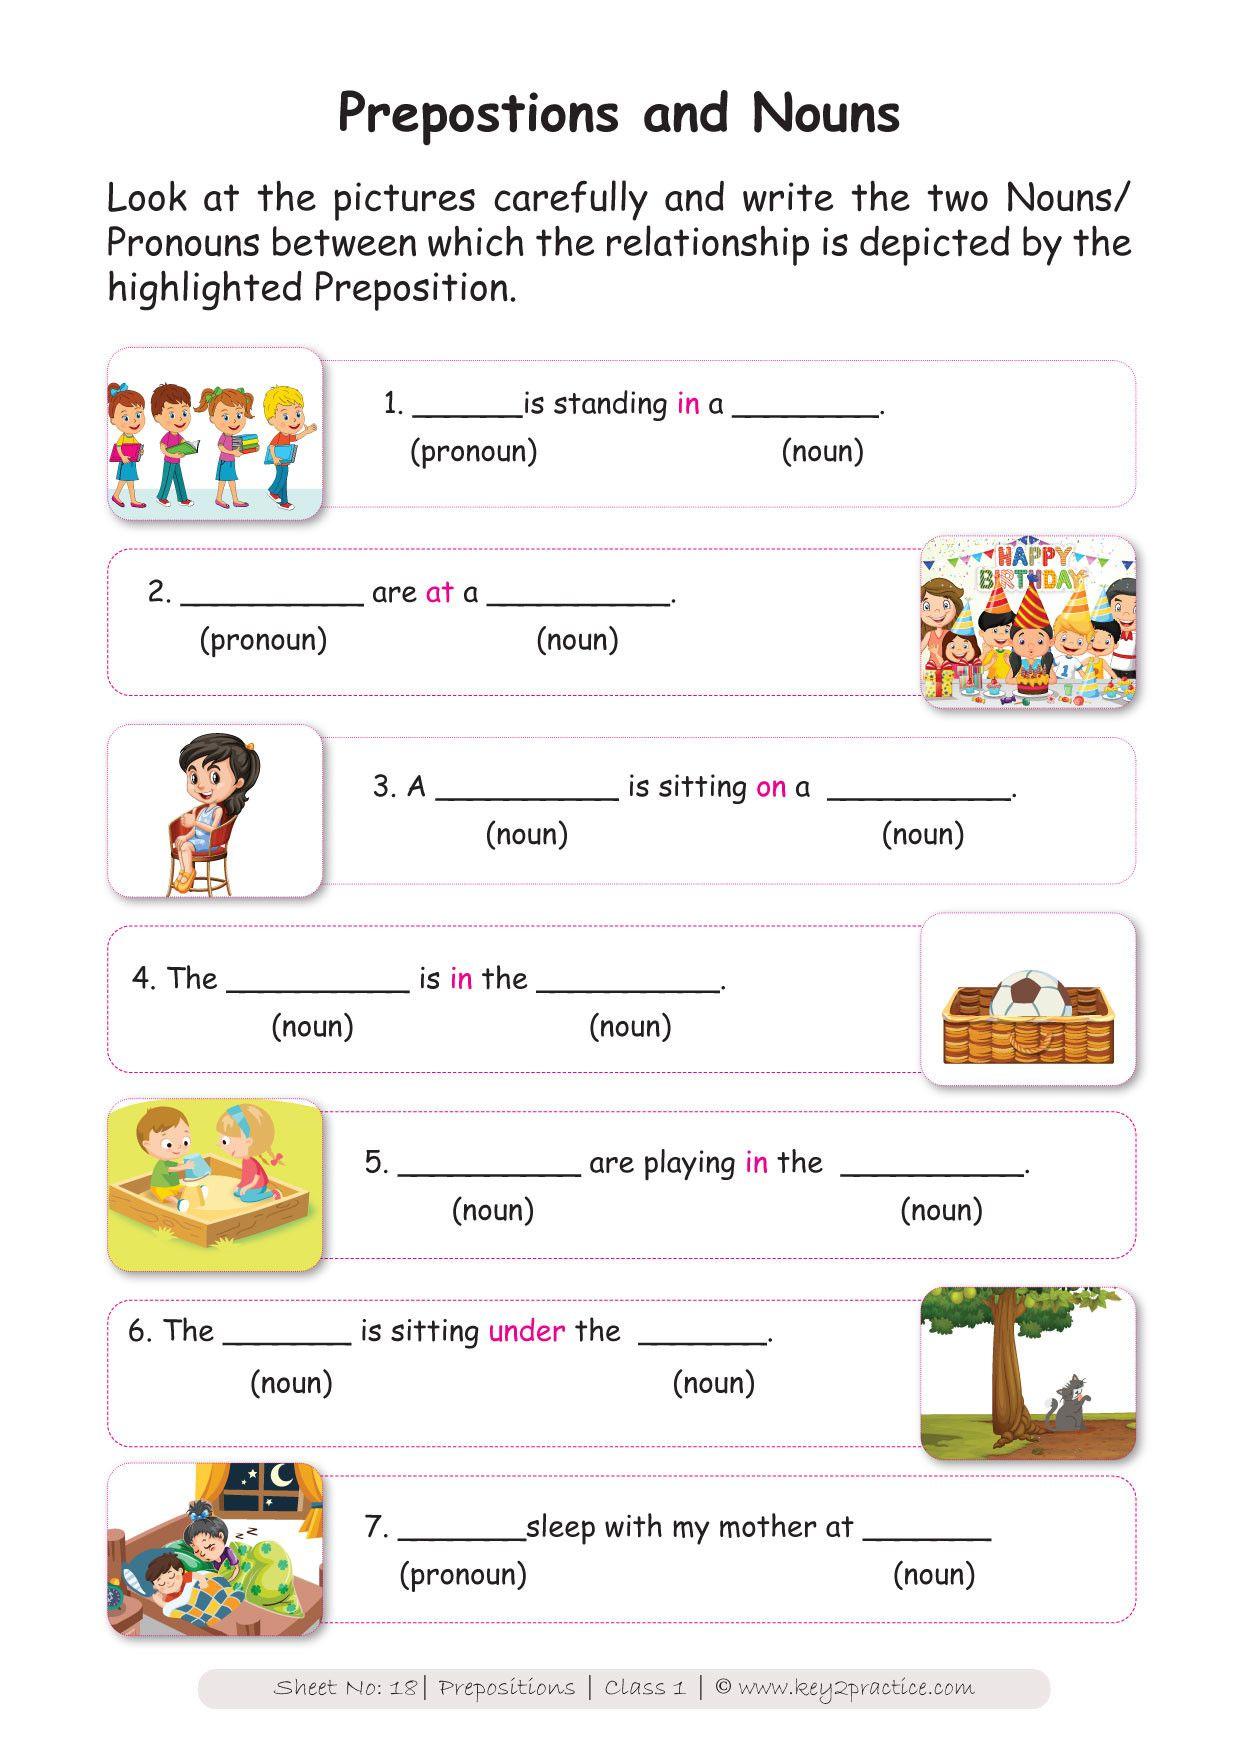 Prepositional Phrases (6th) Prepositional phrases, 6th